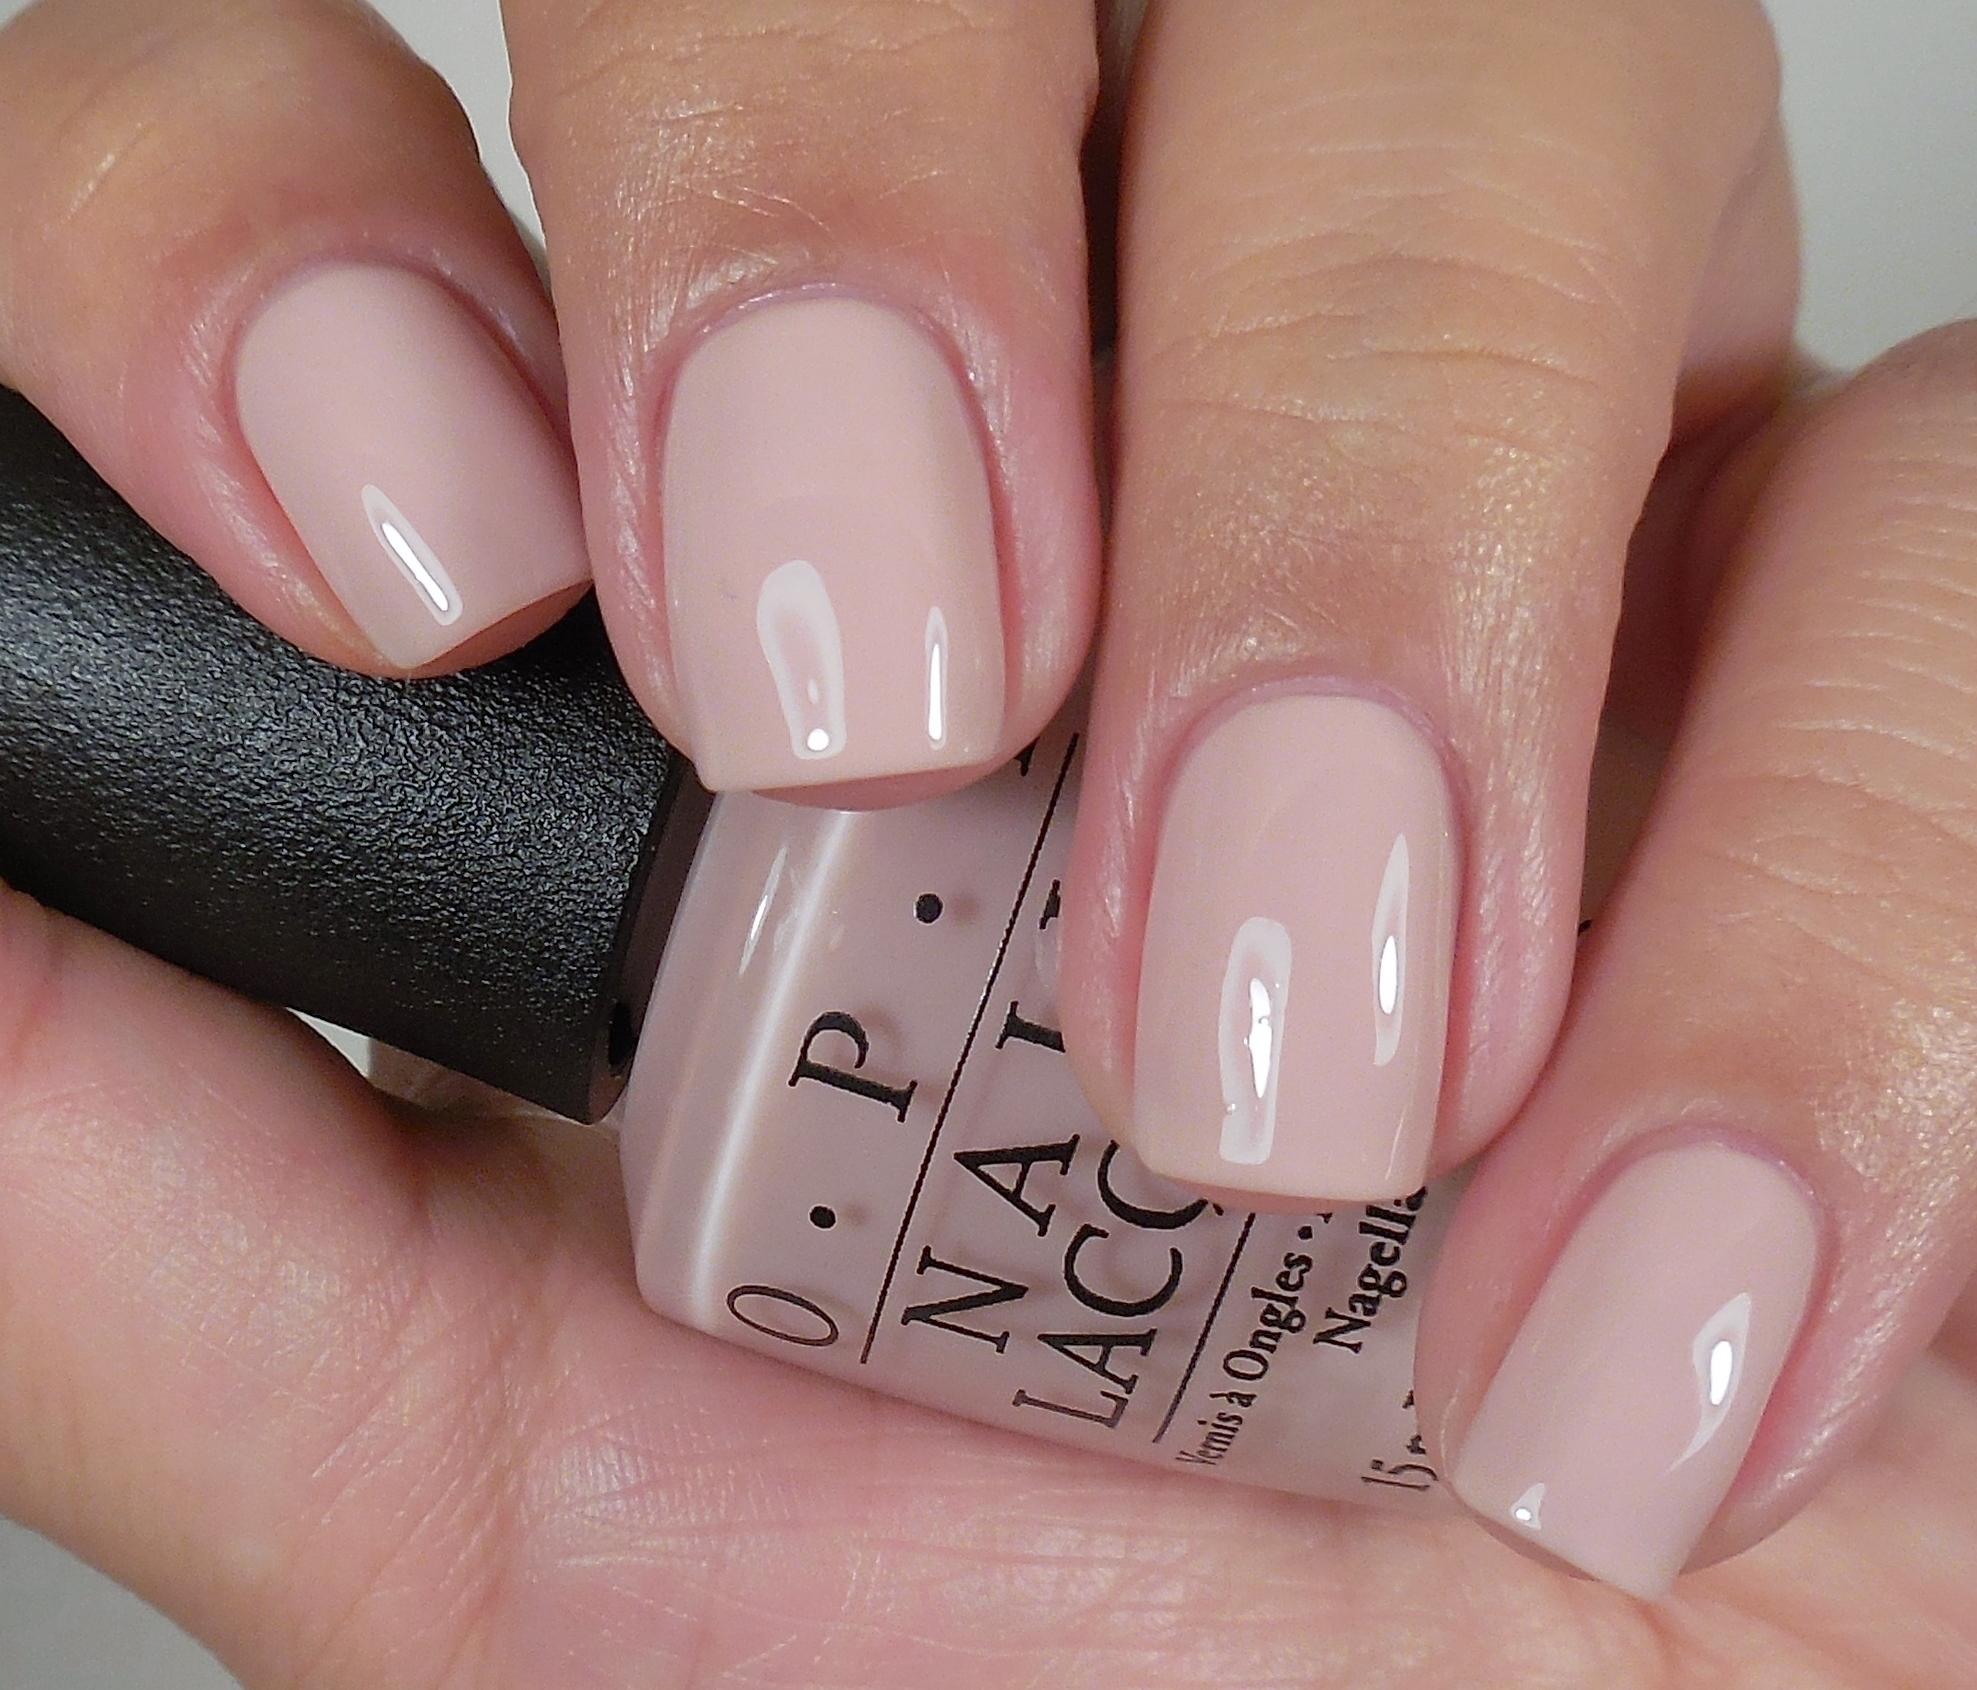 Top Nail Polish Colours: OPI Soft Shades Collection 2015